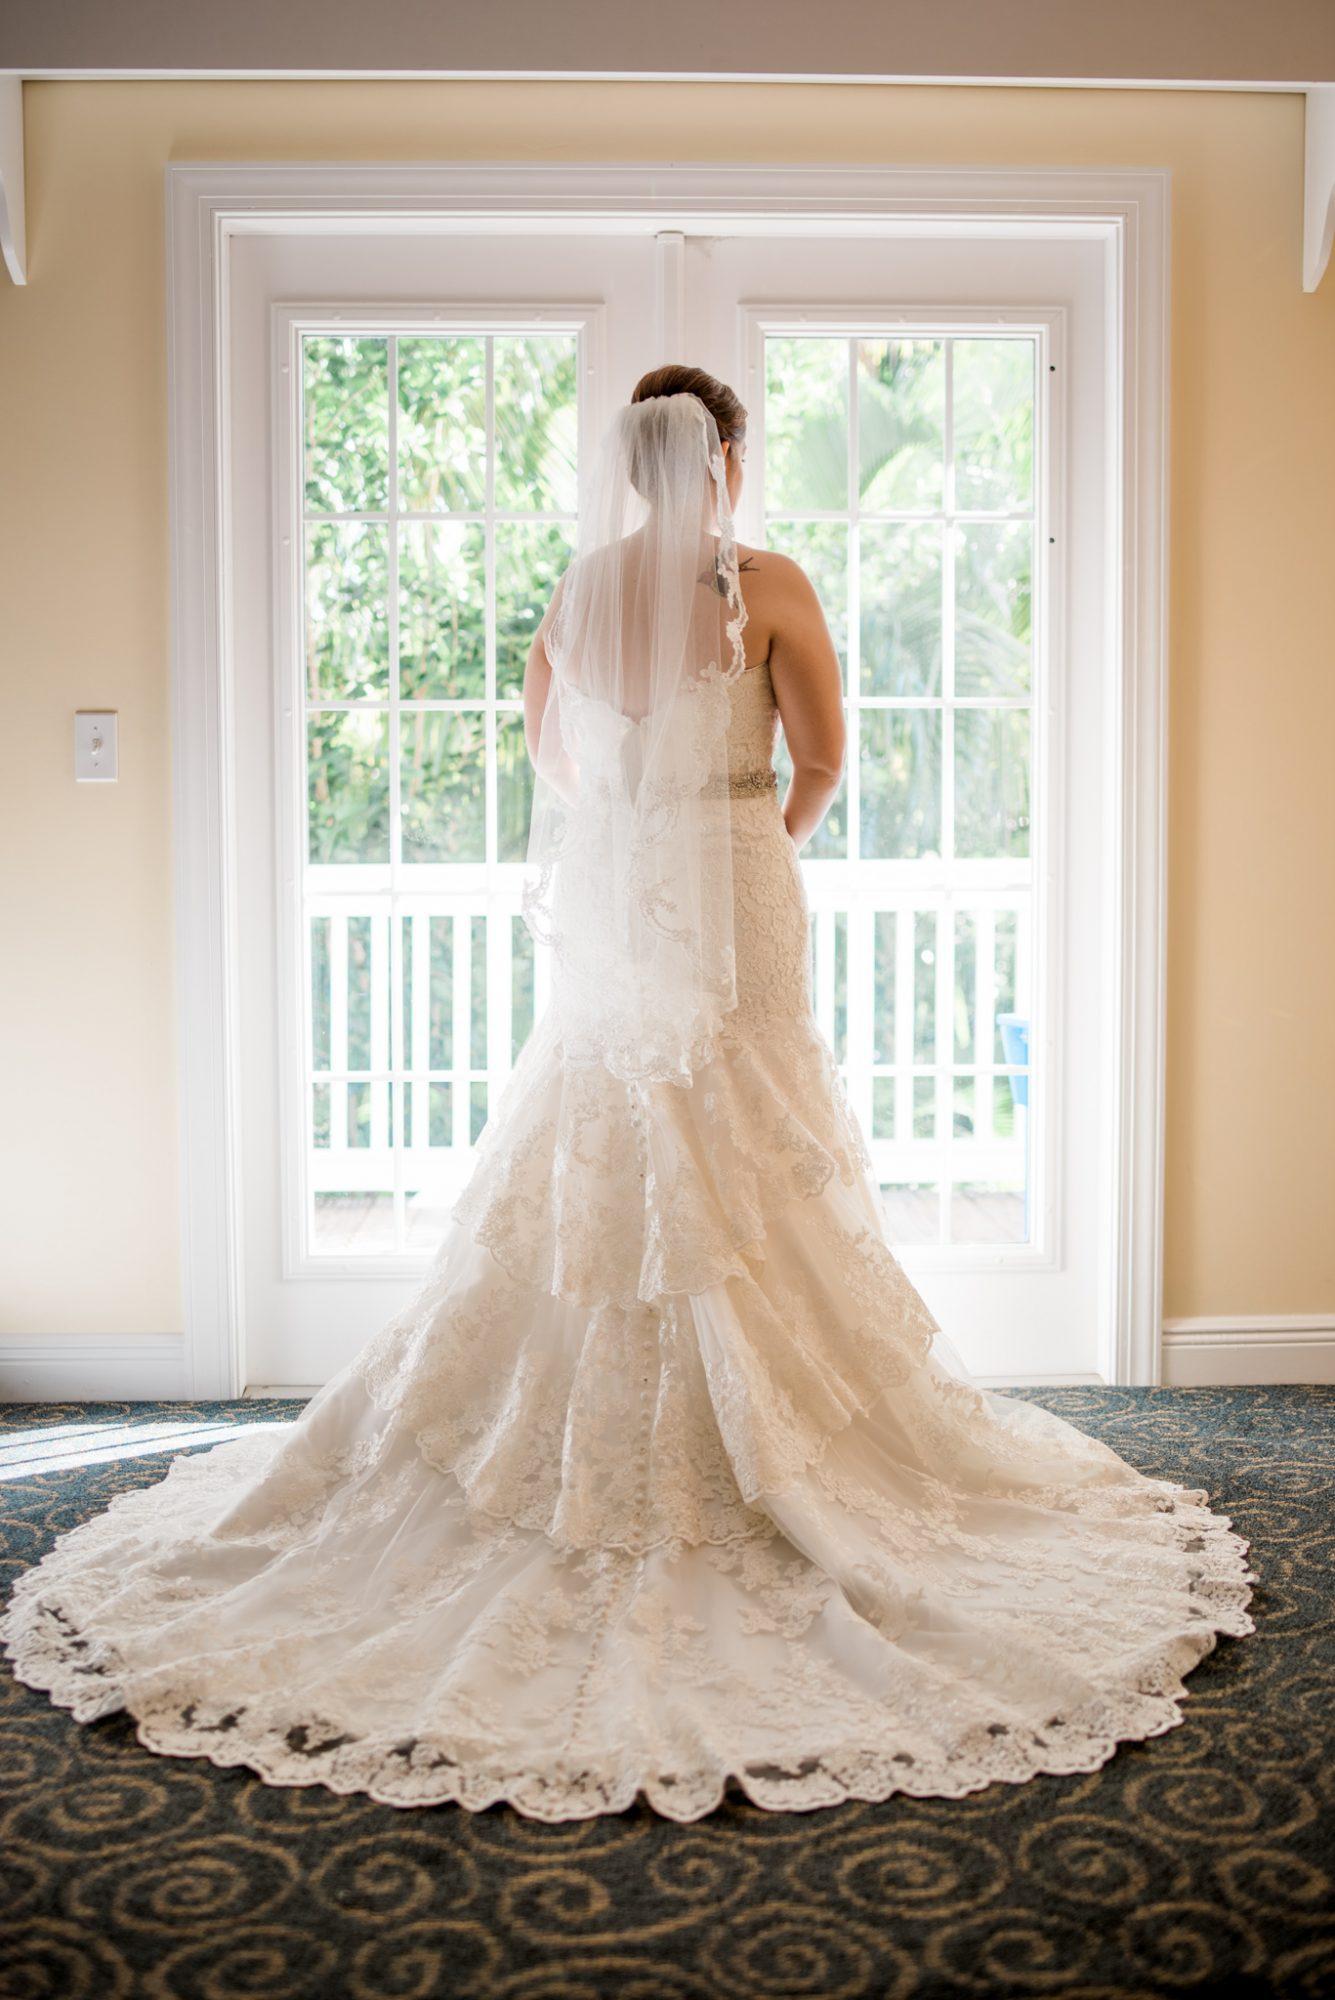 Heather Jeff Key West Wedding Photographer Fort Zachary Taylor 9 - Heather & Jeff - Key West Wedding Photographer - Fort Zachary Taylor